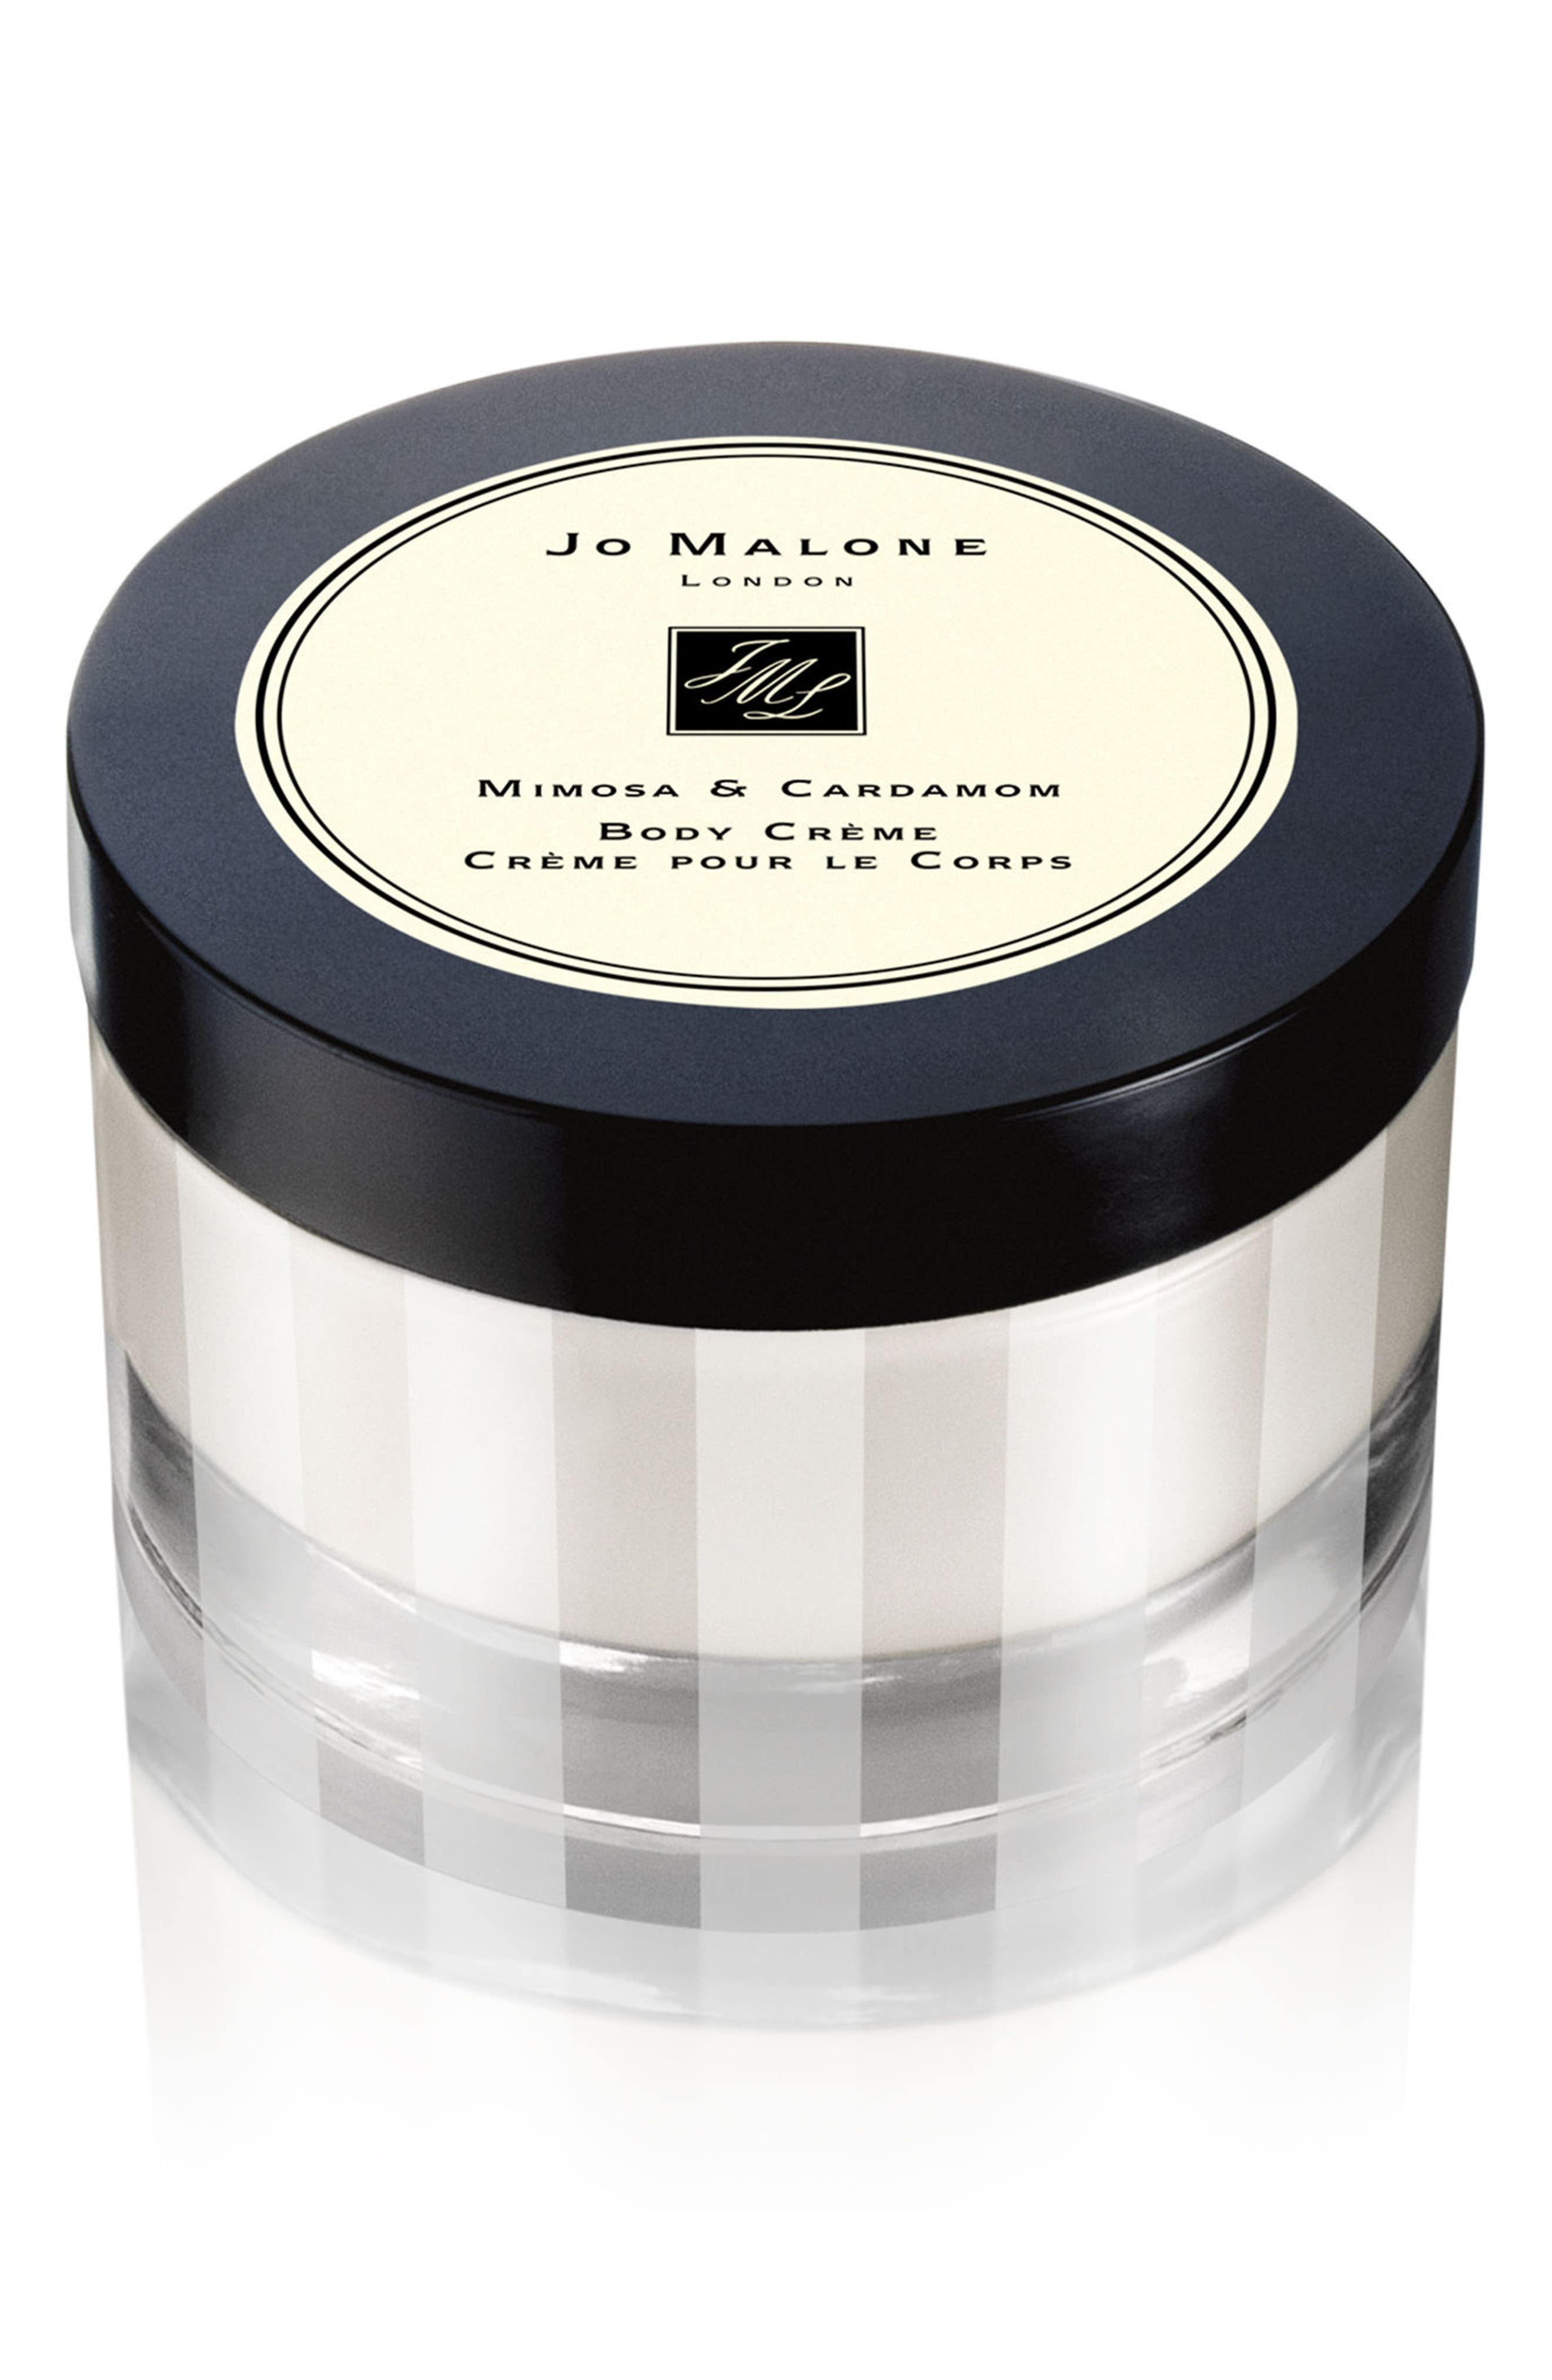 Jo Malone London(TM) Mimosa & Cardamom Body Creme